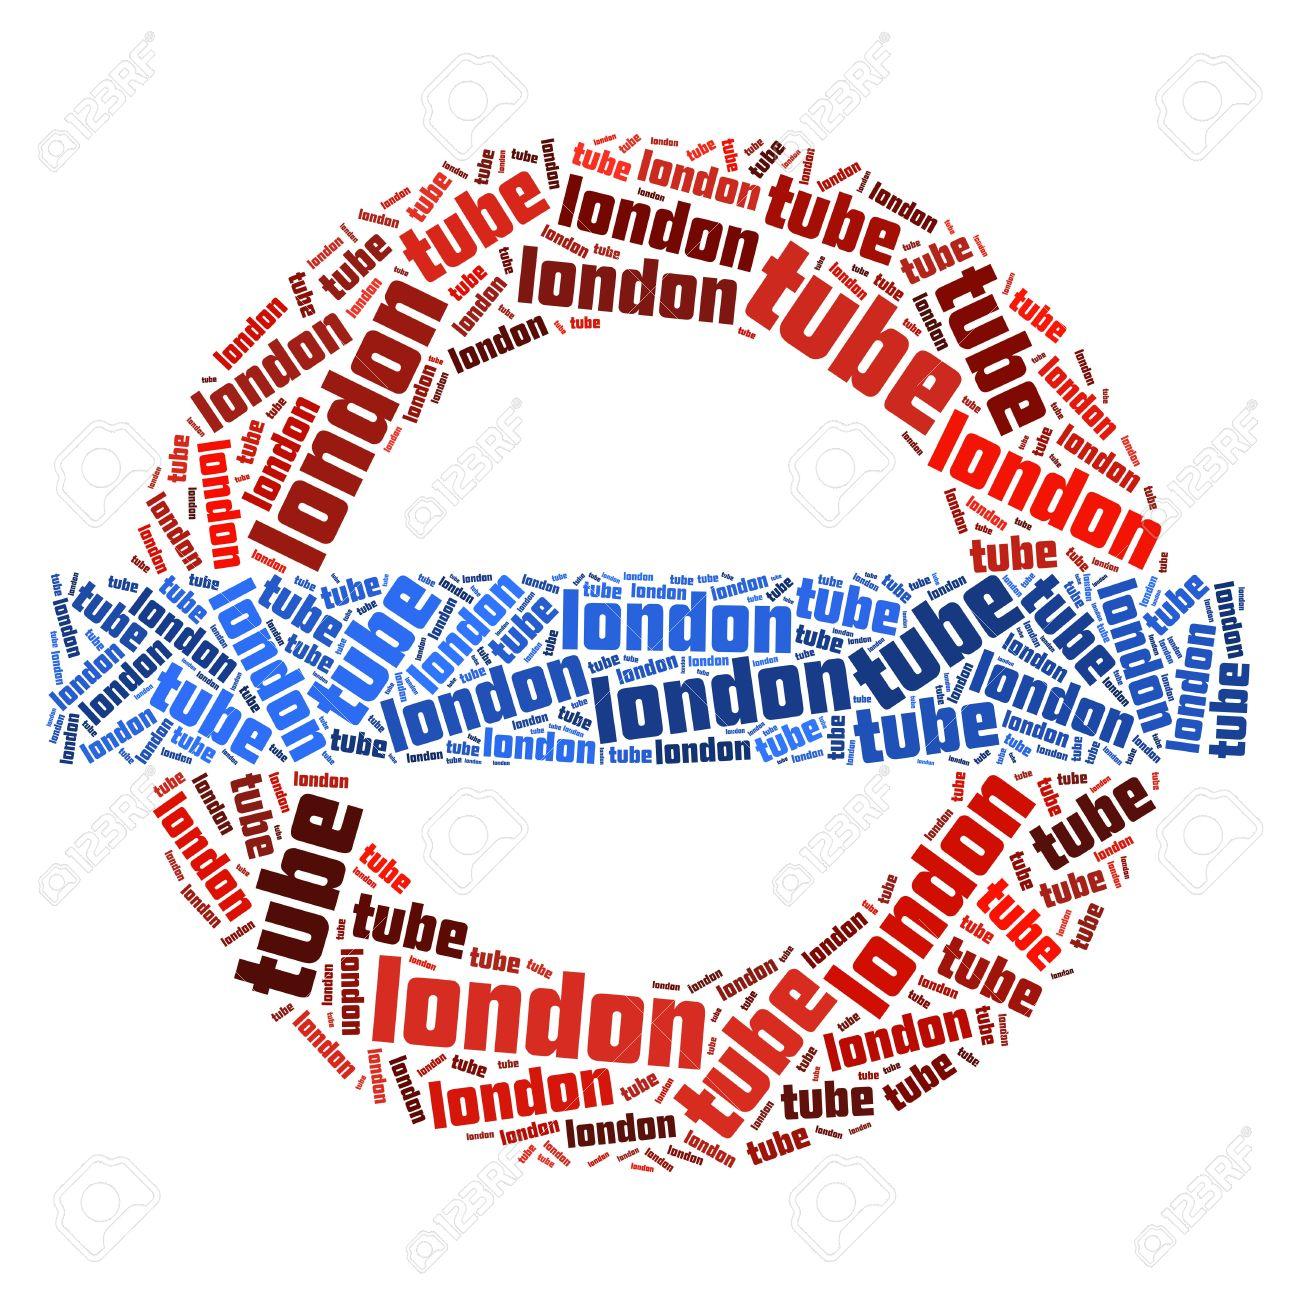 London underground symbol text graphic and arrangement concept london underground symbol text graphic and arrangement concept on white background stock photo 13095082 buycottarizona Images